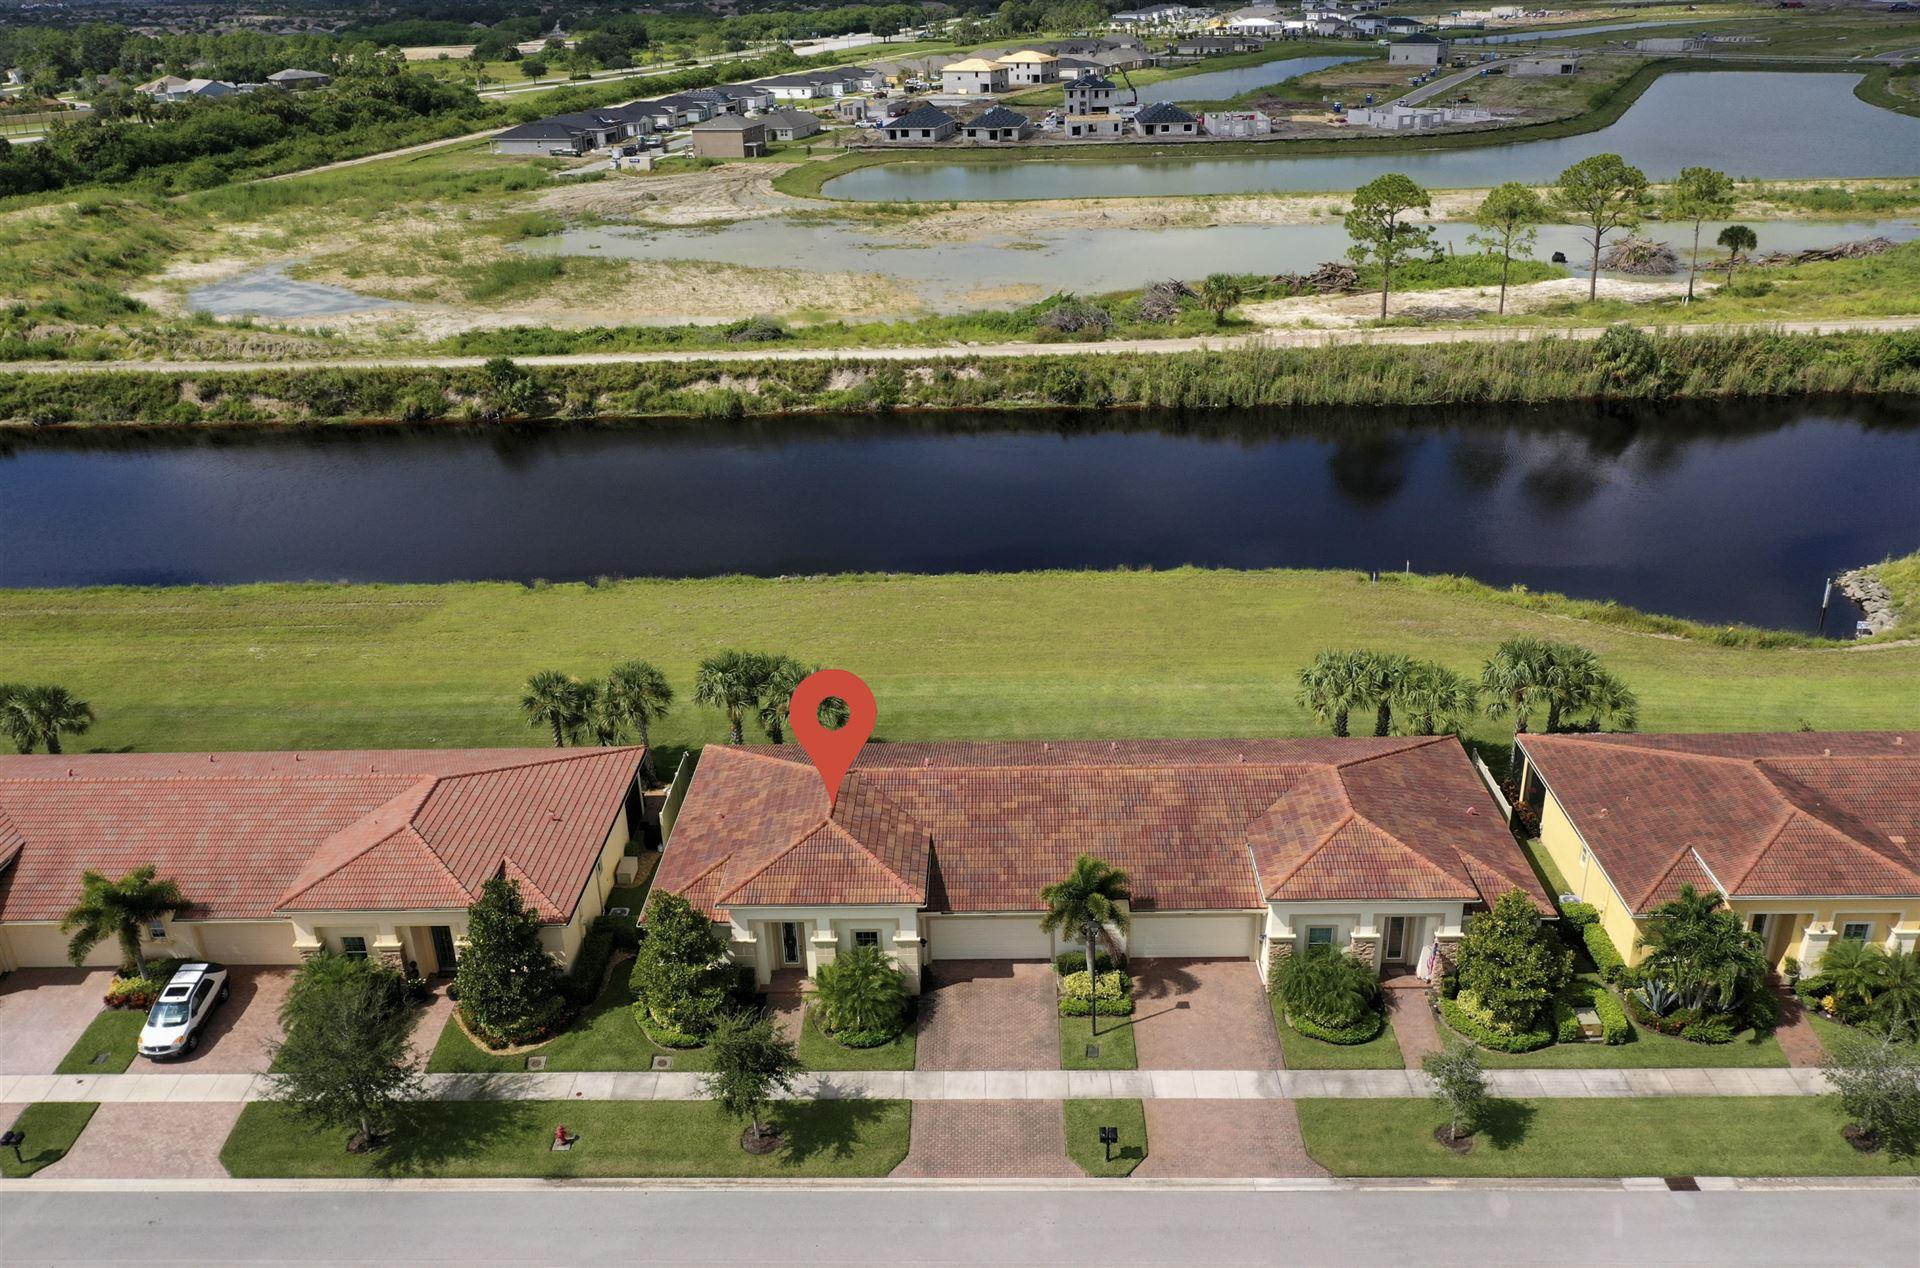 Photo of 10333 SW Ambrose Way, Port Saint Lucie, FL 34986 (MLS # RX-10651511)